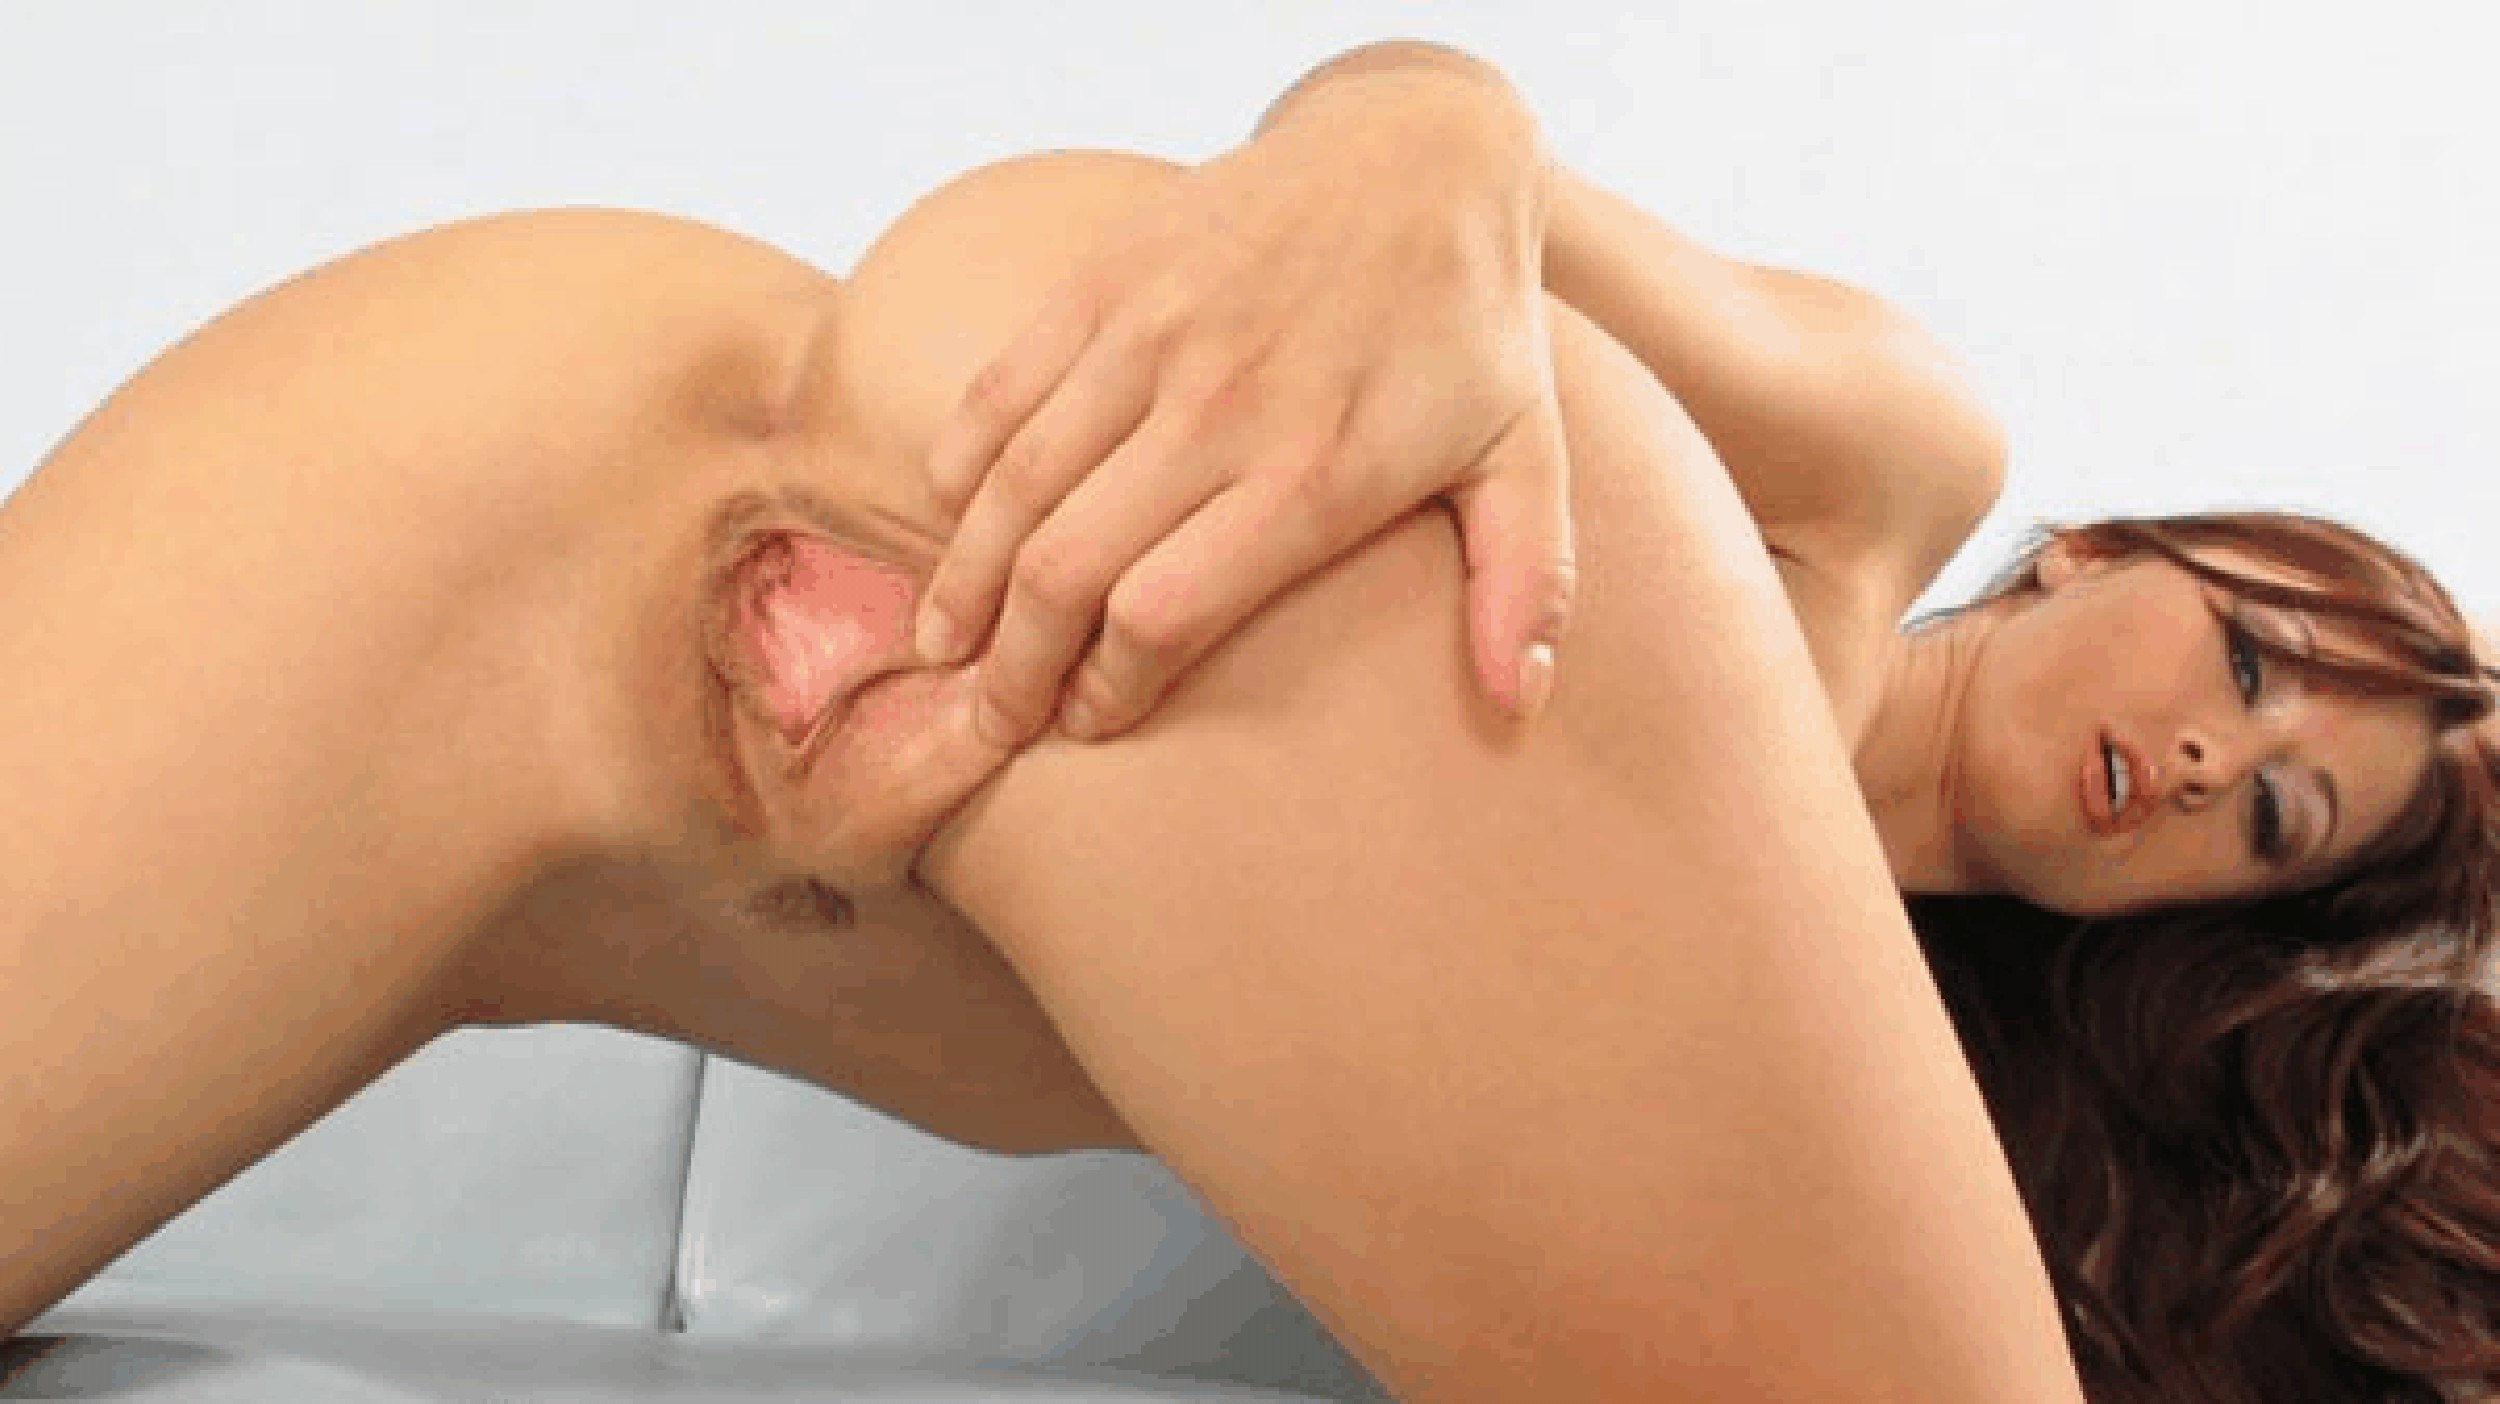 девушки с очень горячими кисками - секс порно фото